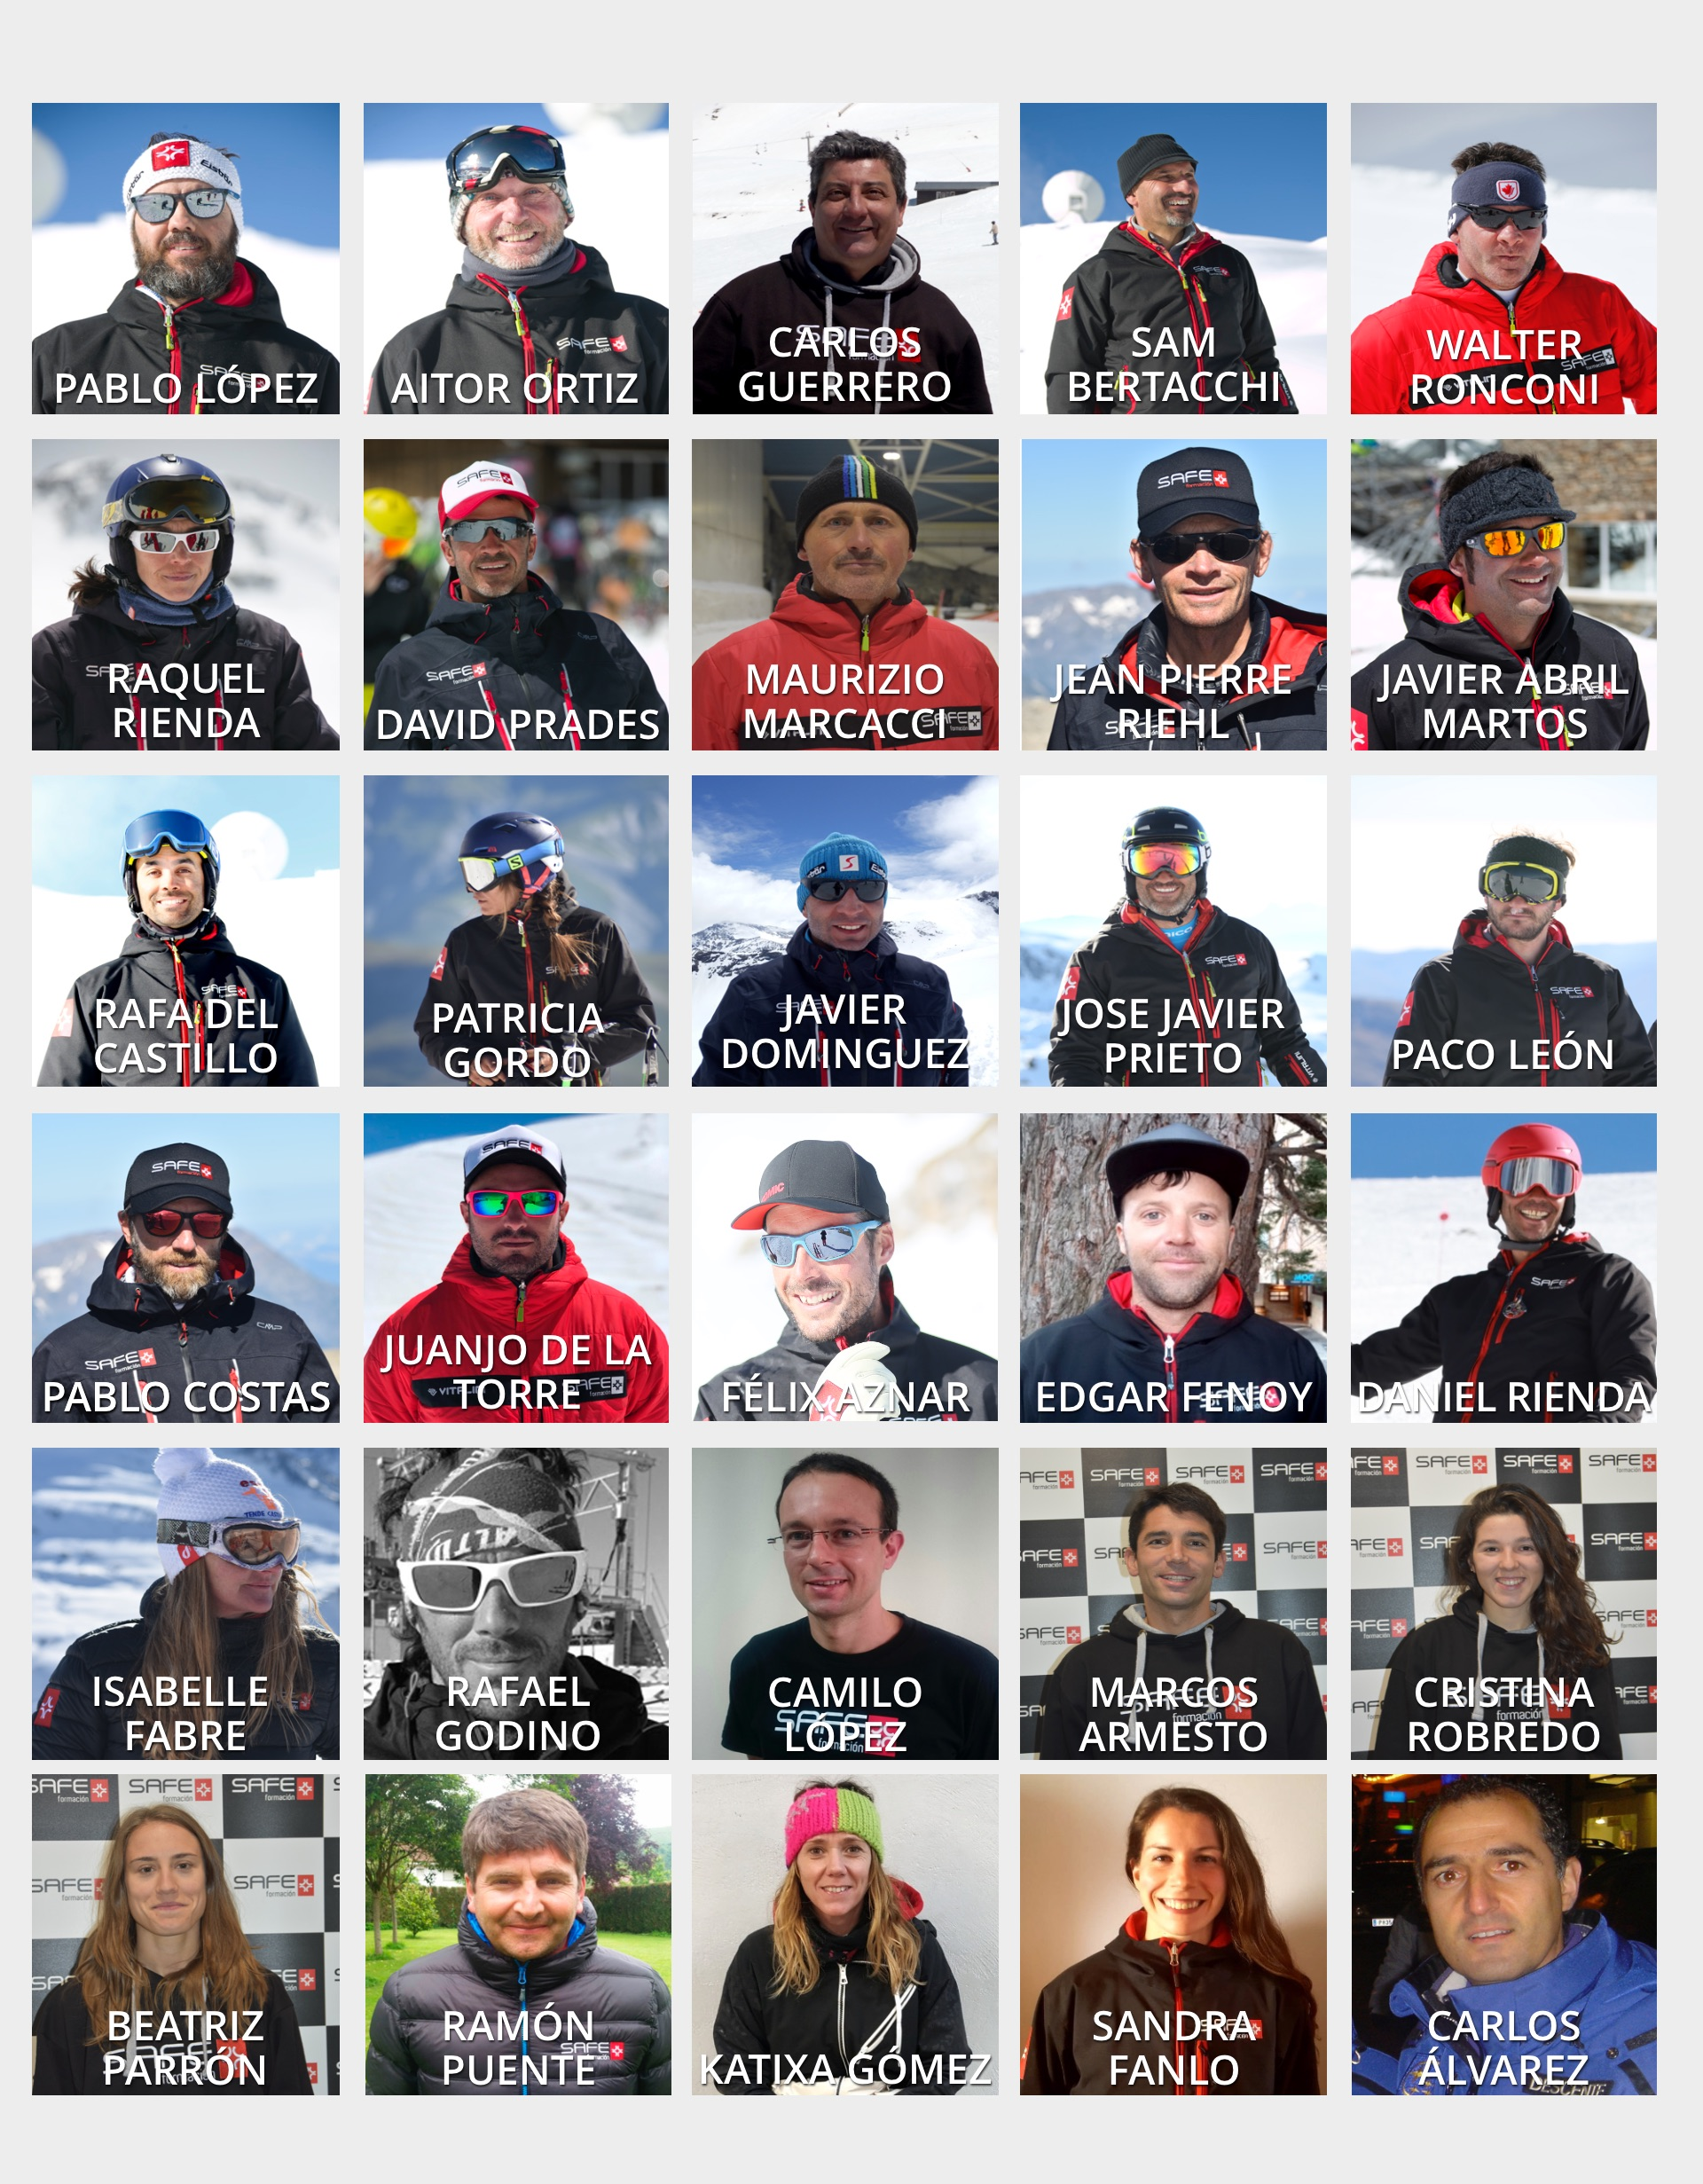 safe-formacion-deportiva-tecnicos-deportivos-esqui-alpino-equipo-2